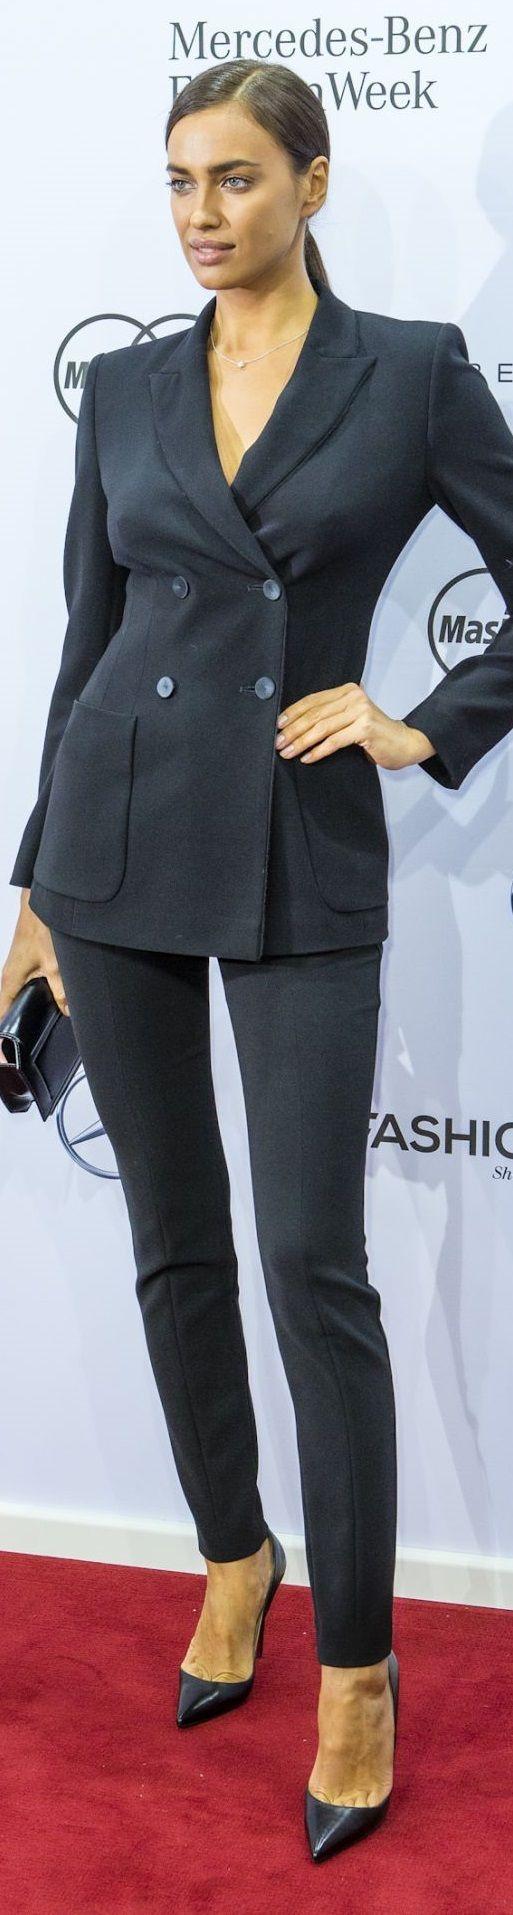 Irina Shayk – Marc Cain Fashion Show – 2016/2017 F/W Berlin Mercedes-Benz Fashion Week in Berlin, January 2016